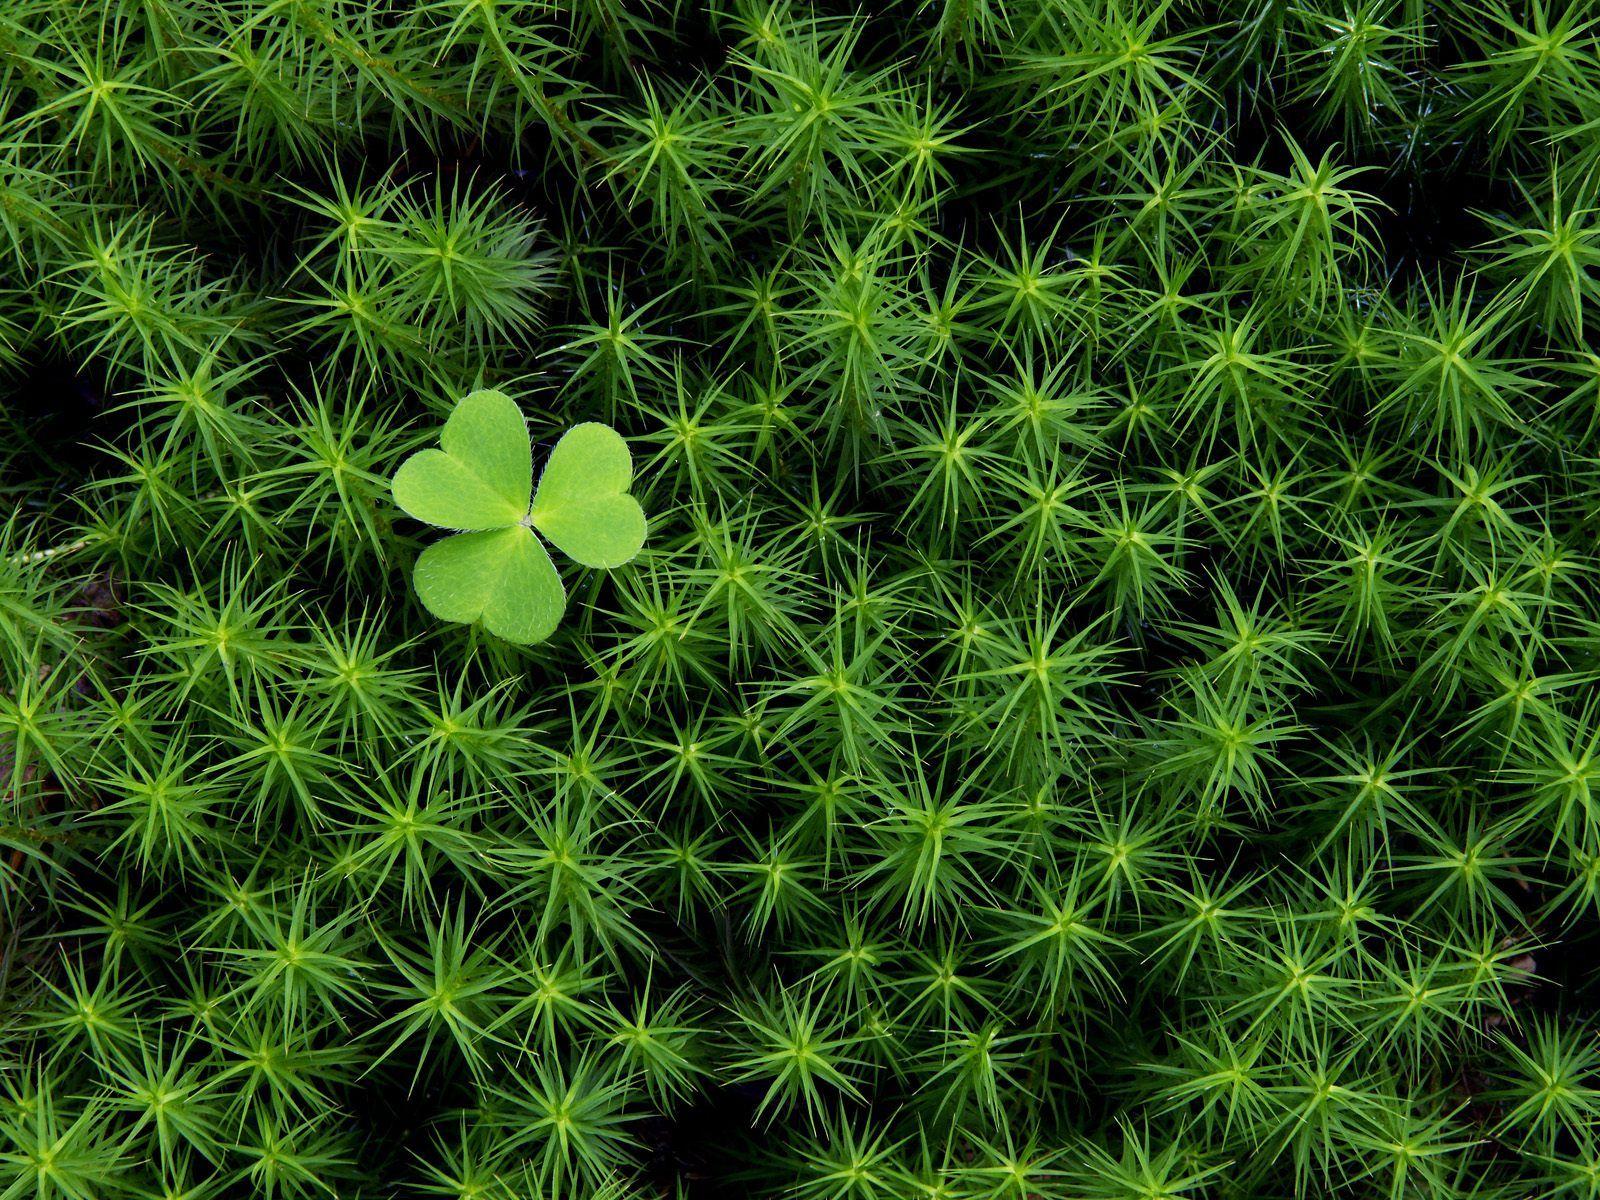 One Small Green Shamrock Moss Irish Moss Irish